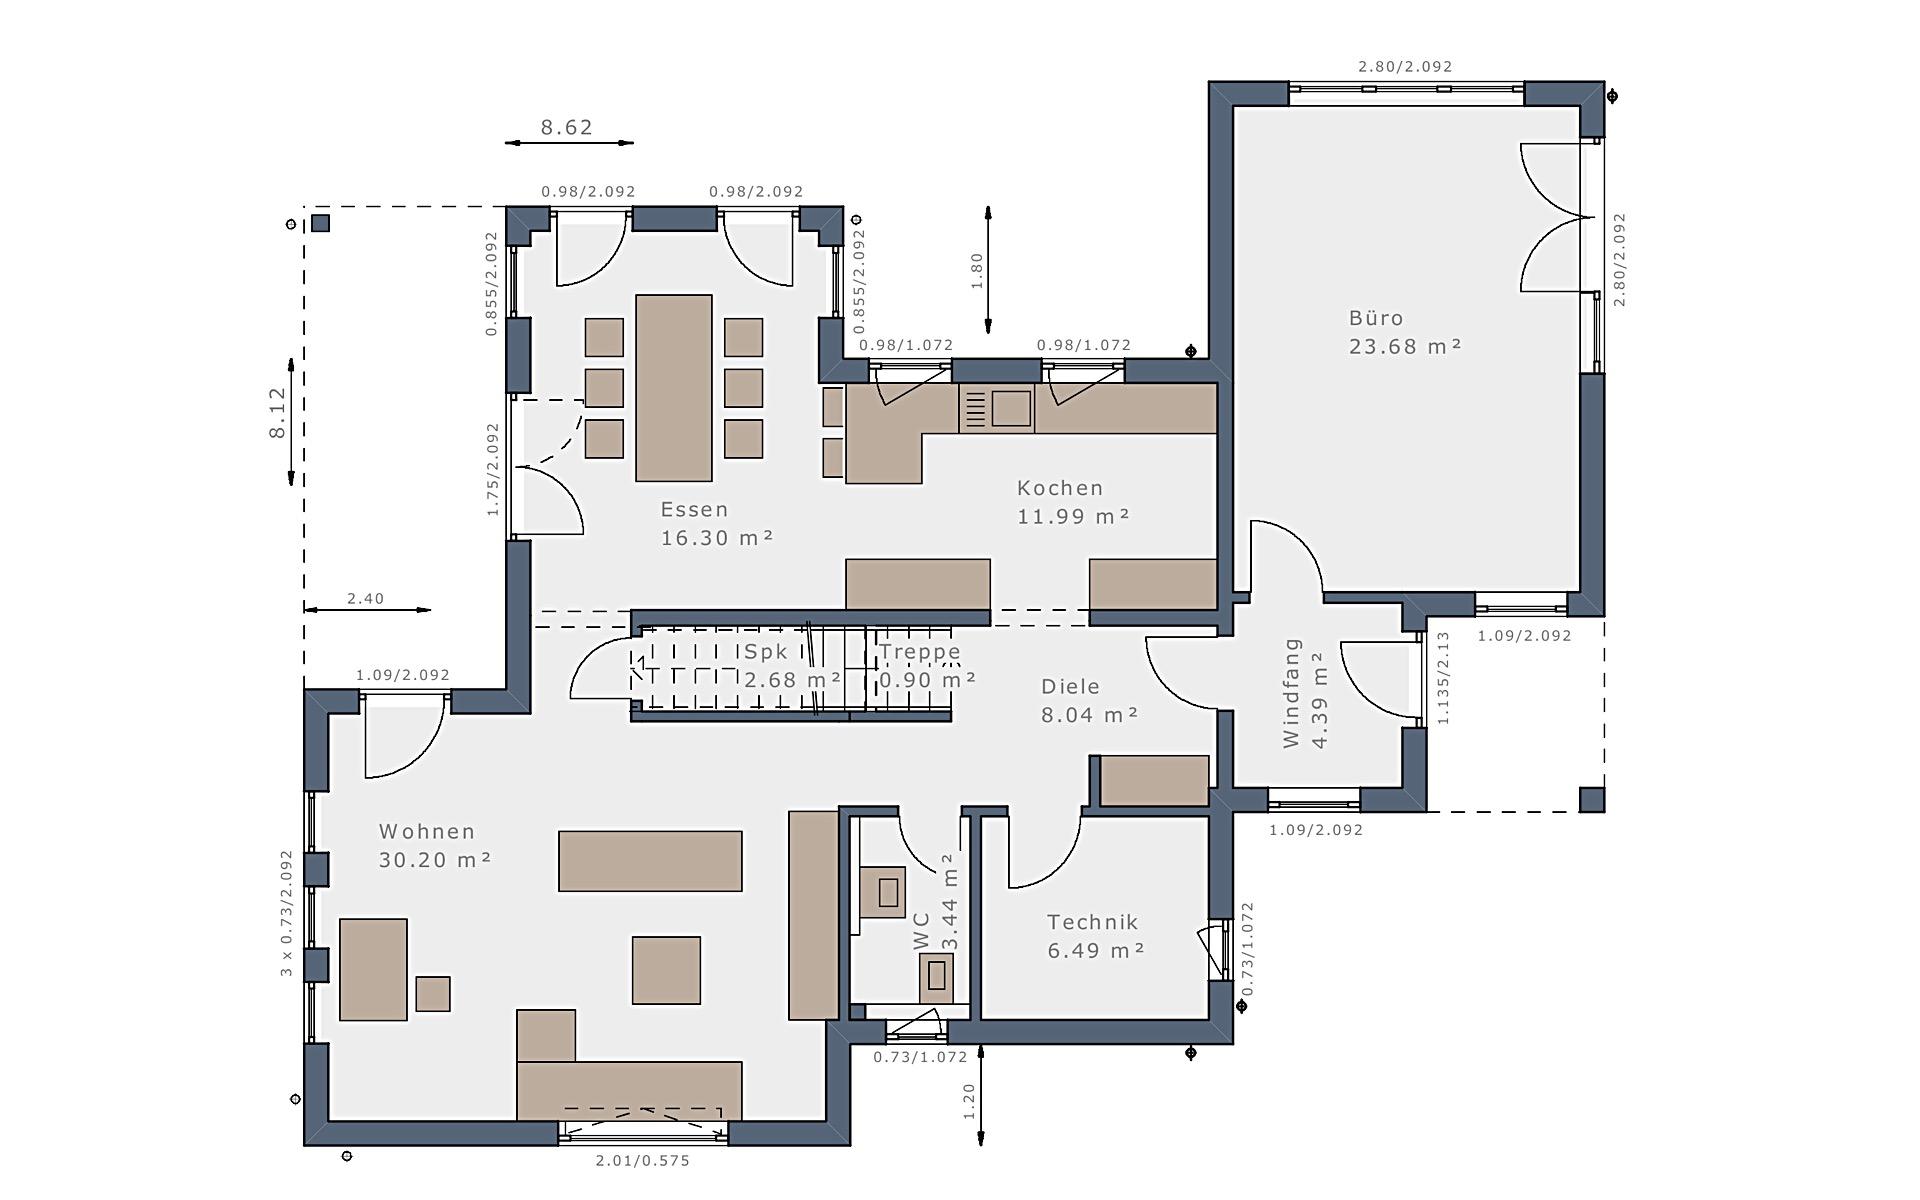 Erdgeschoss Solitaire-E-115 E9 von Schwabenhaus GmbH & Co. KG